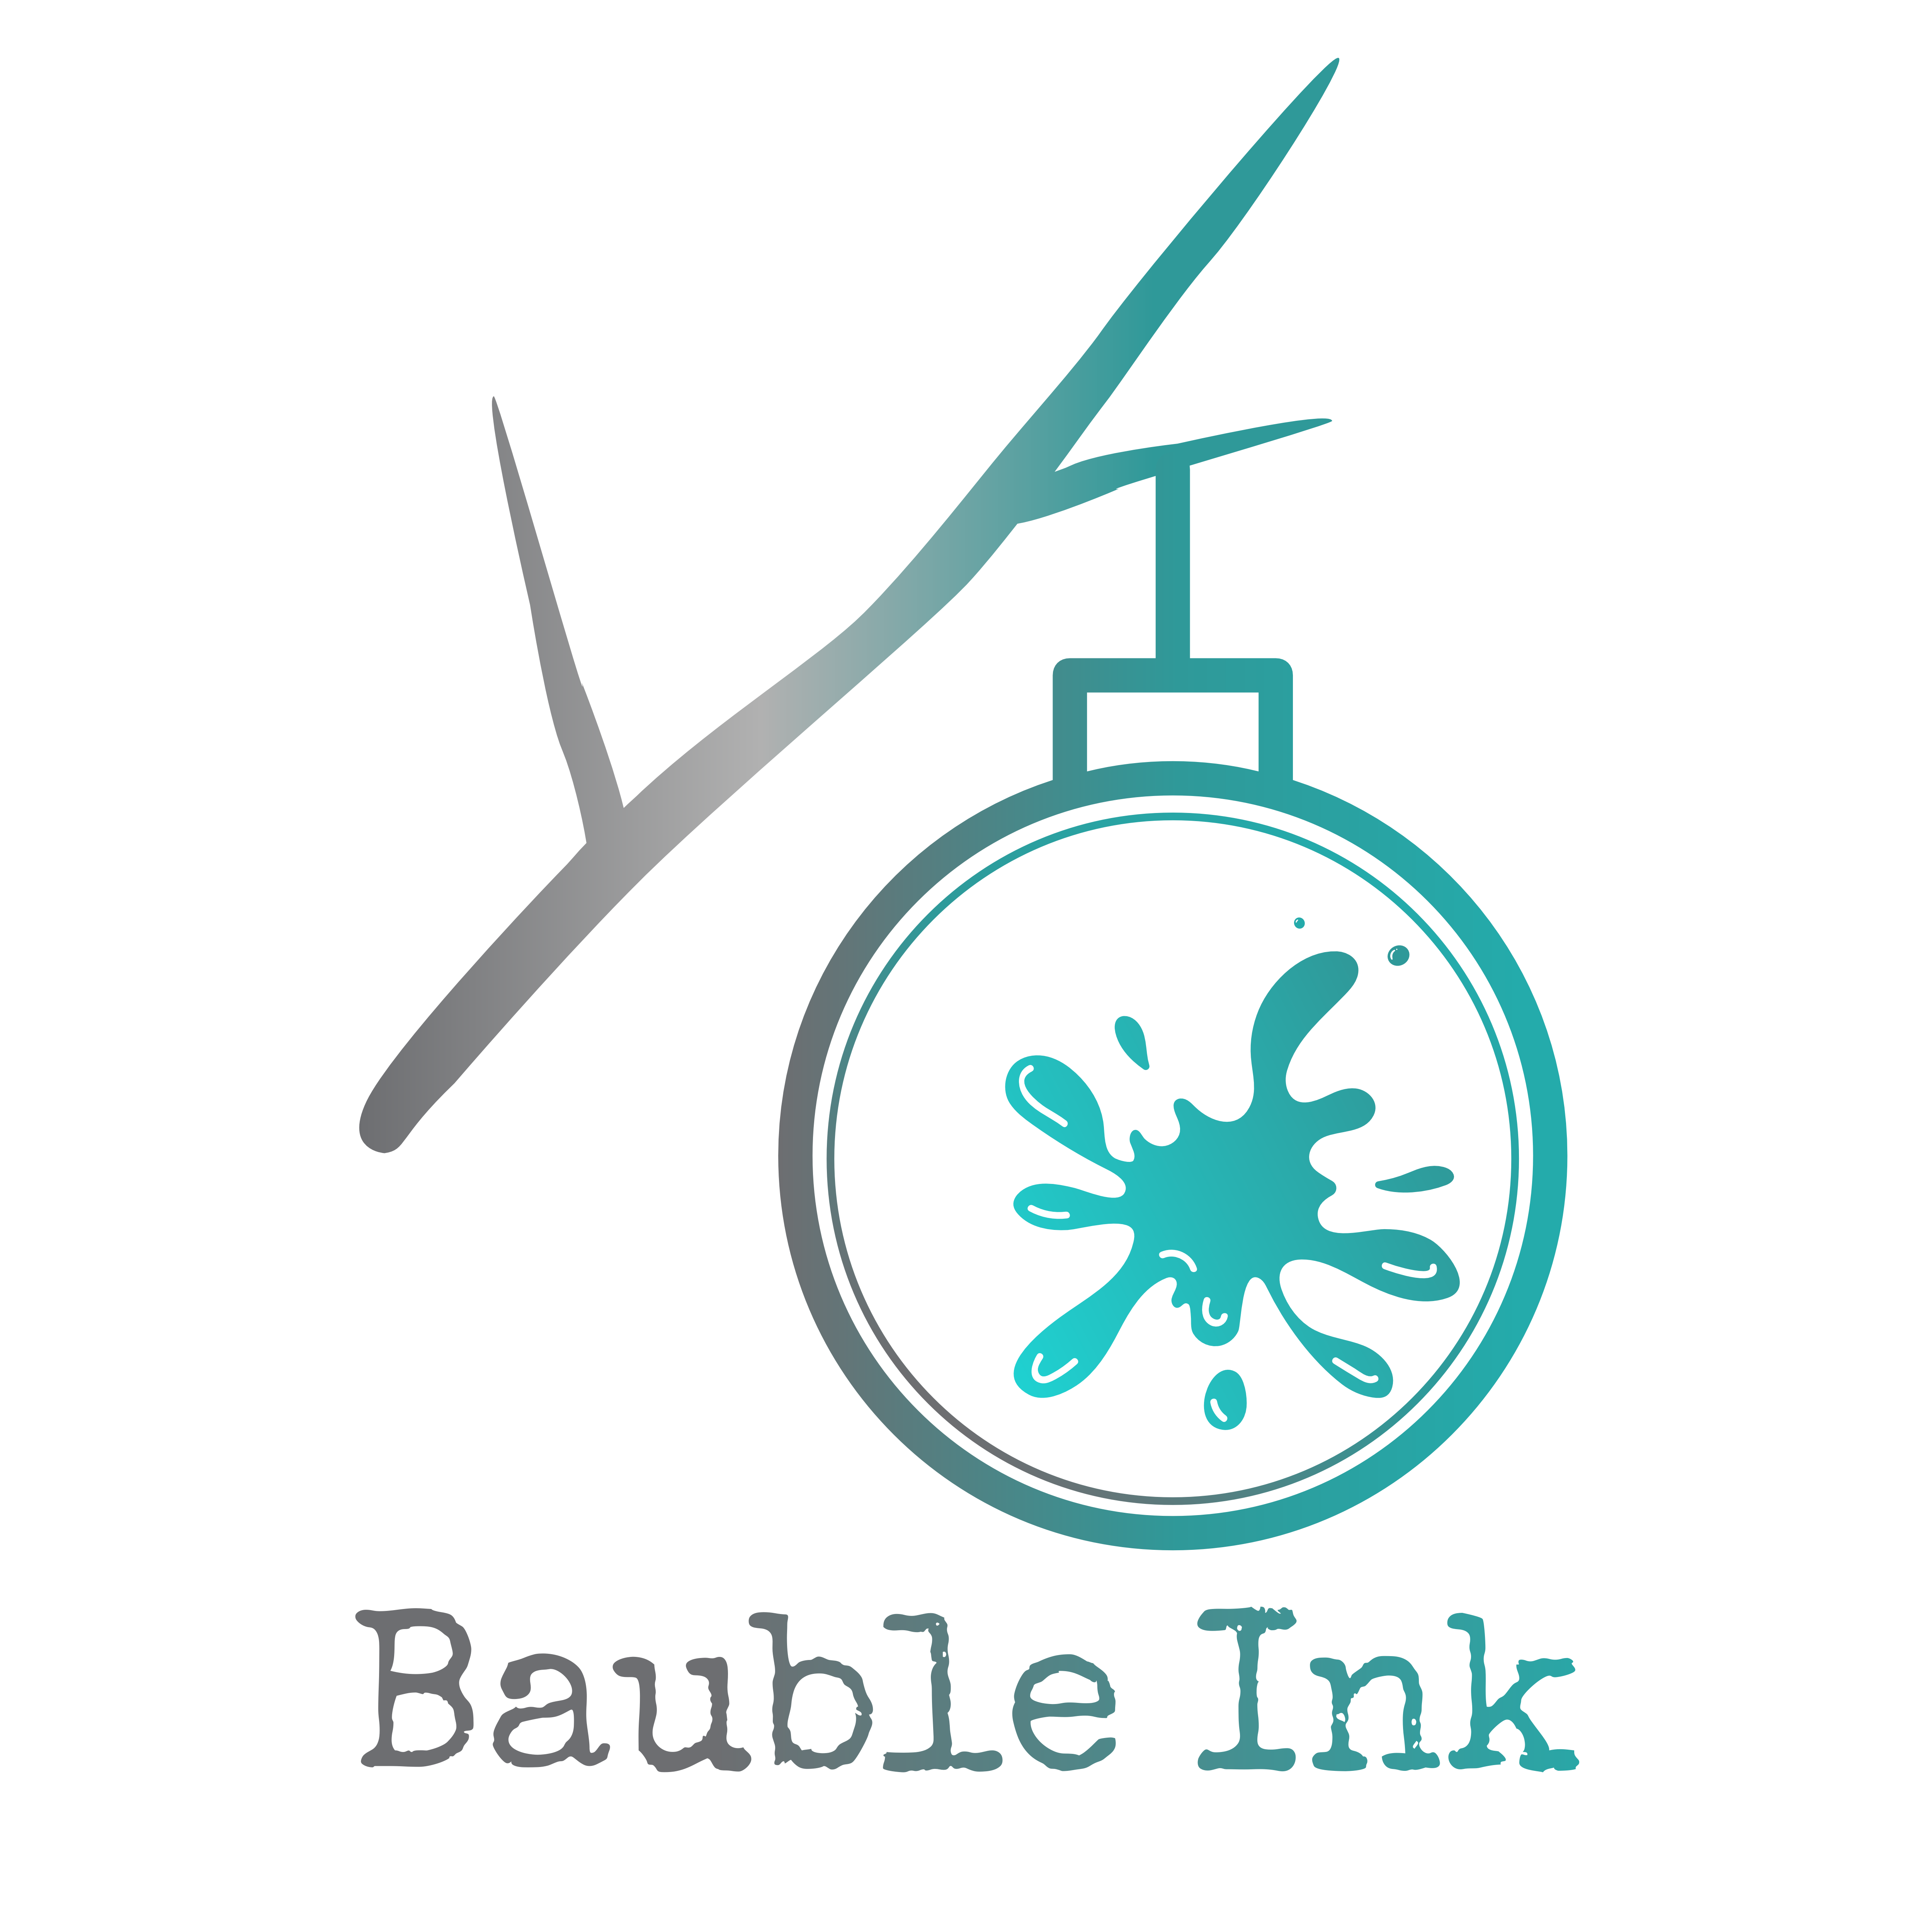 bauble-ink-logo